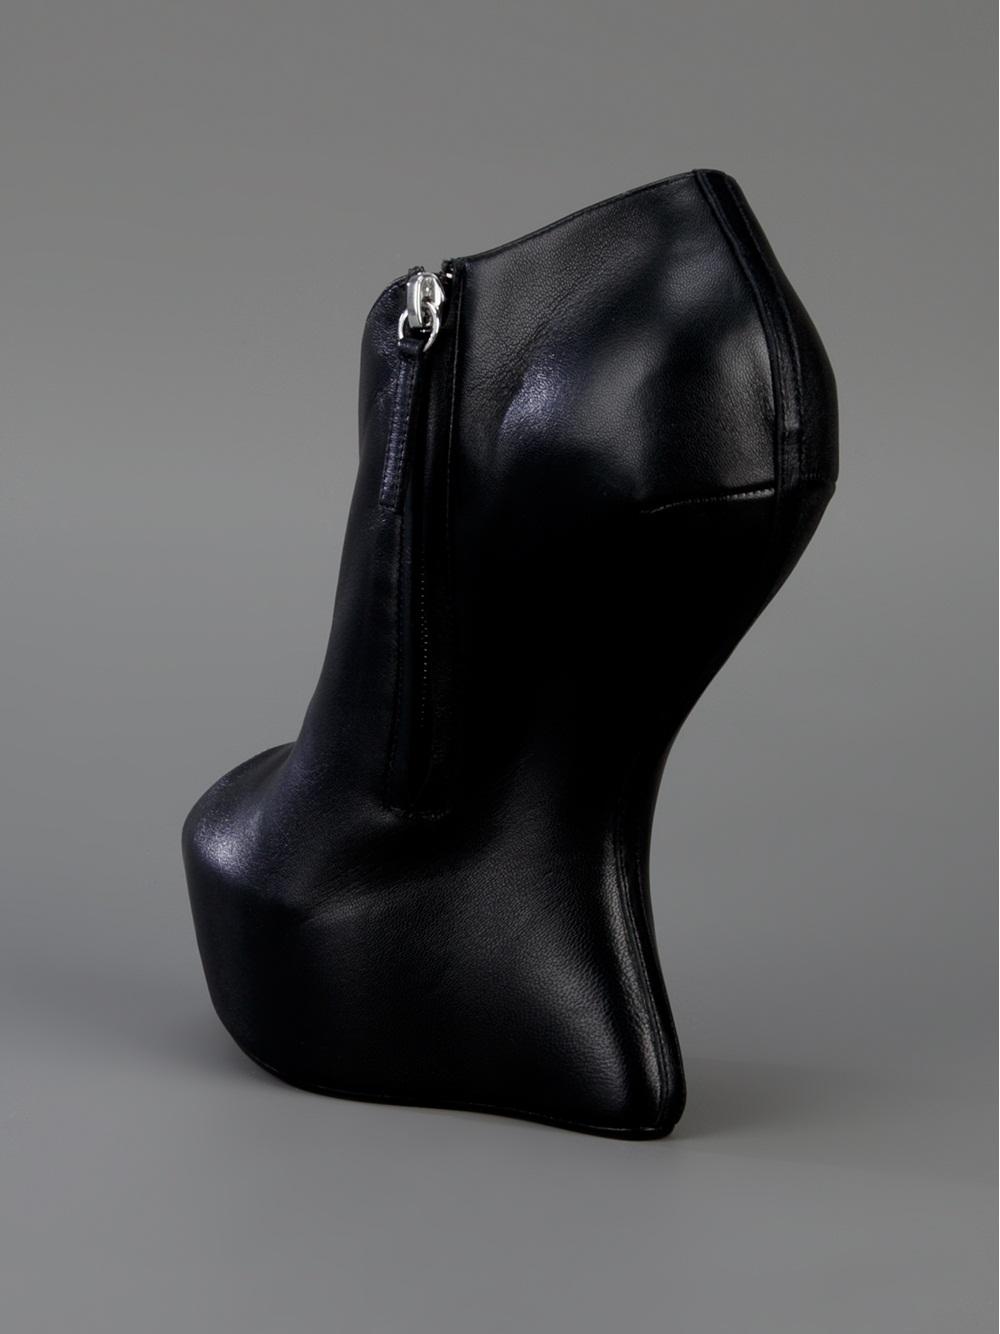 e52b041b0370 Lyst - Giuseppe Zanotti Sculpted Wedge Bootie in Black